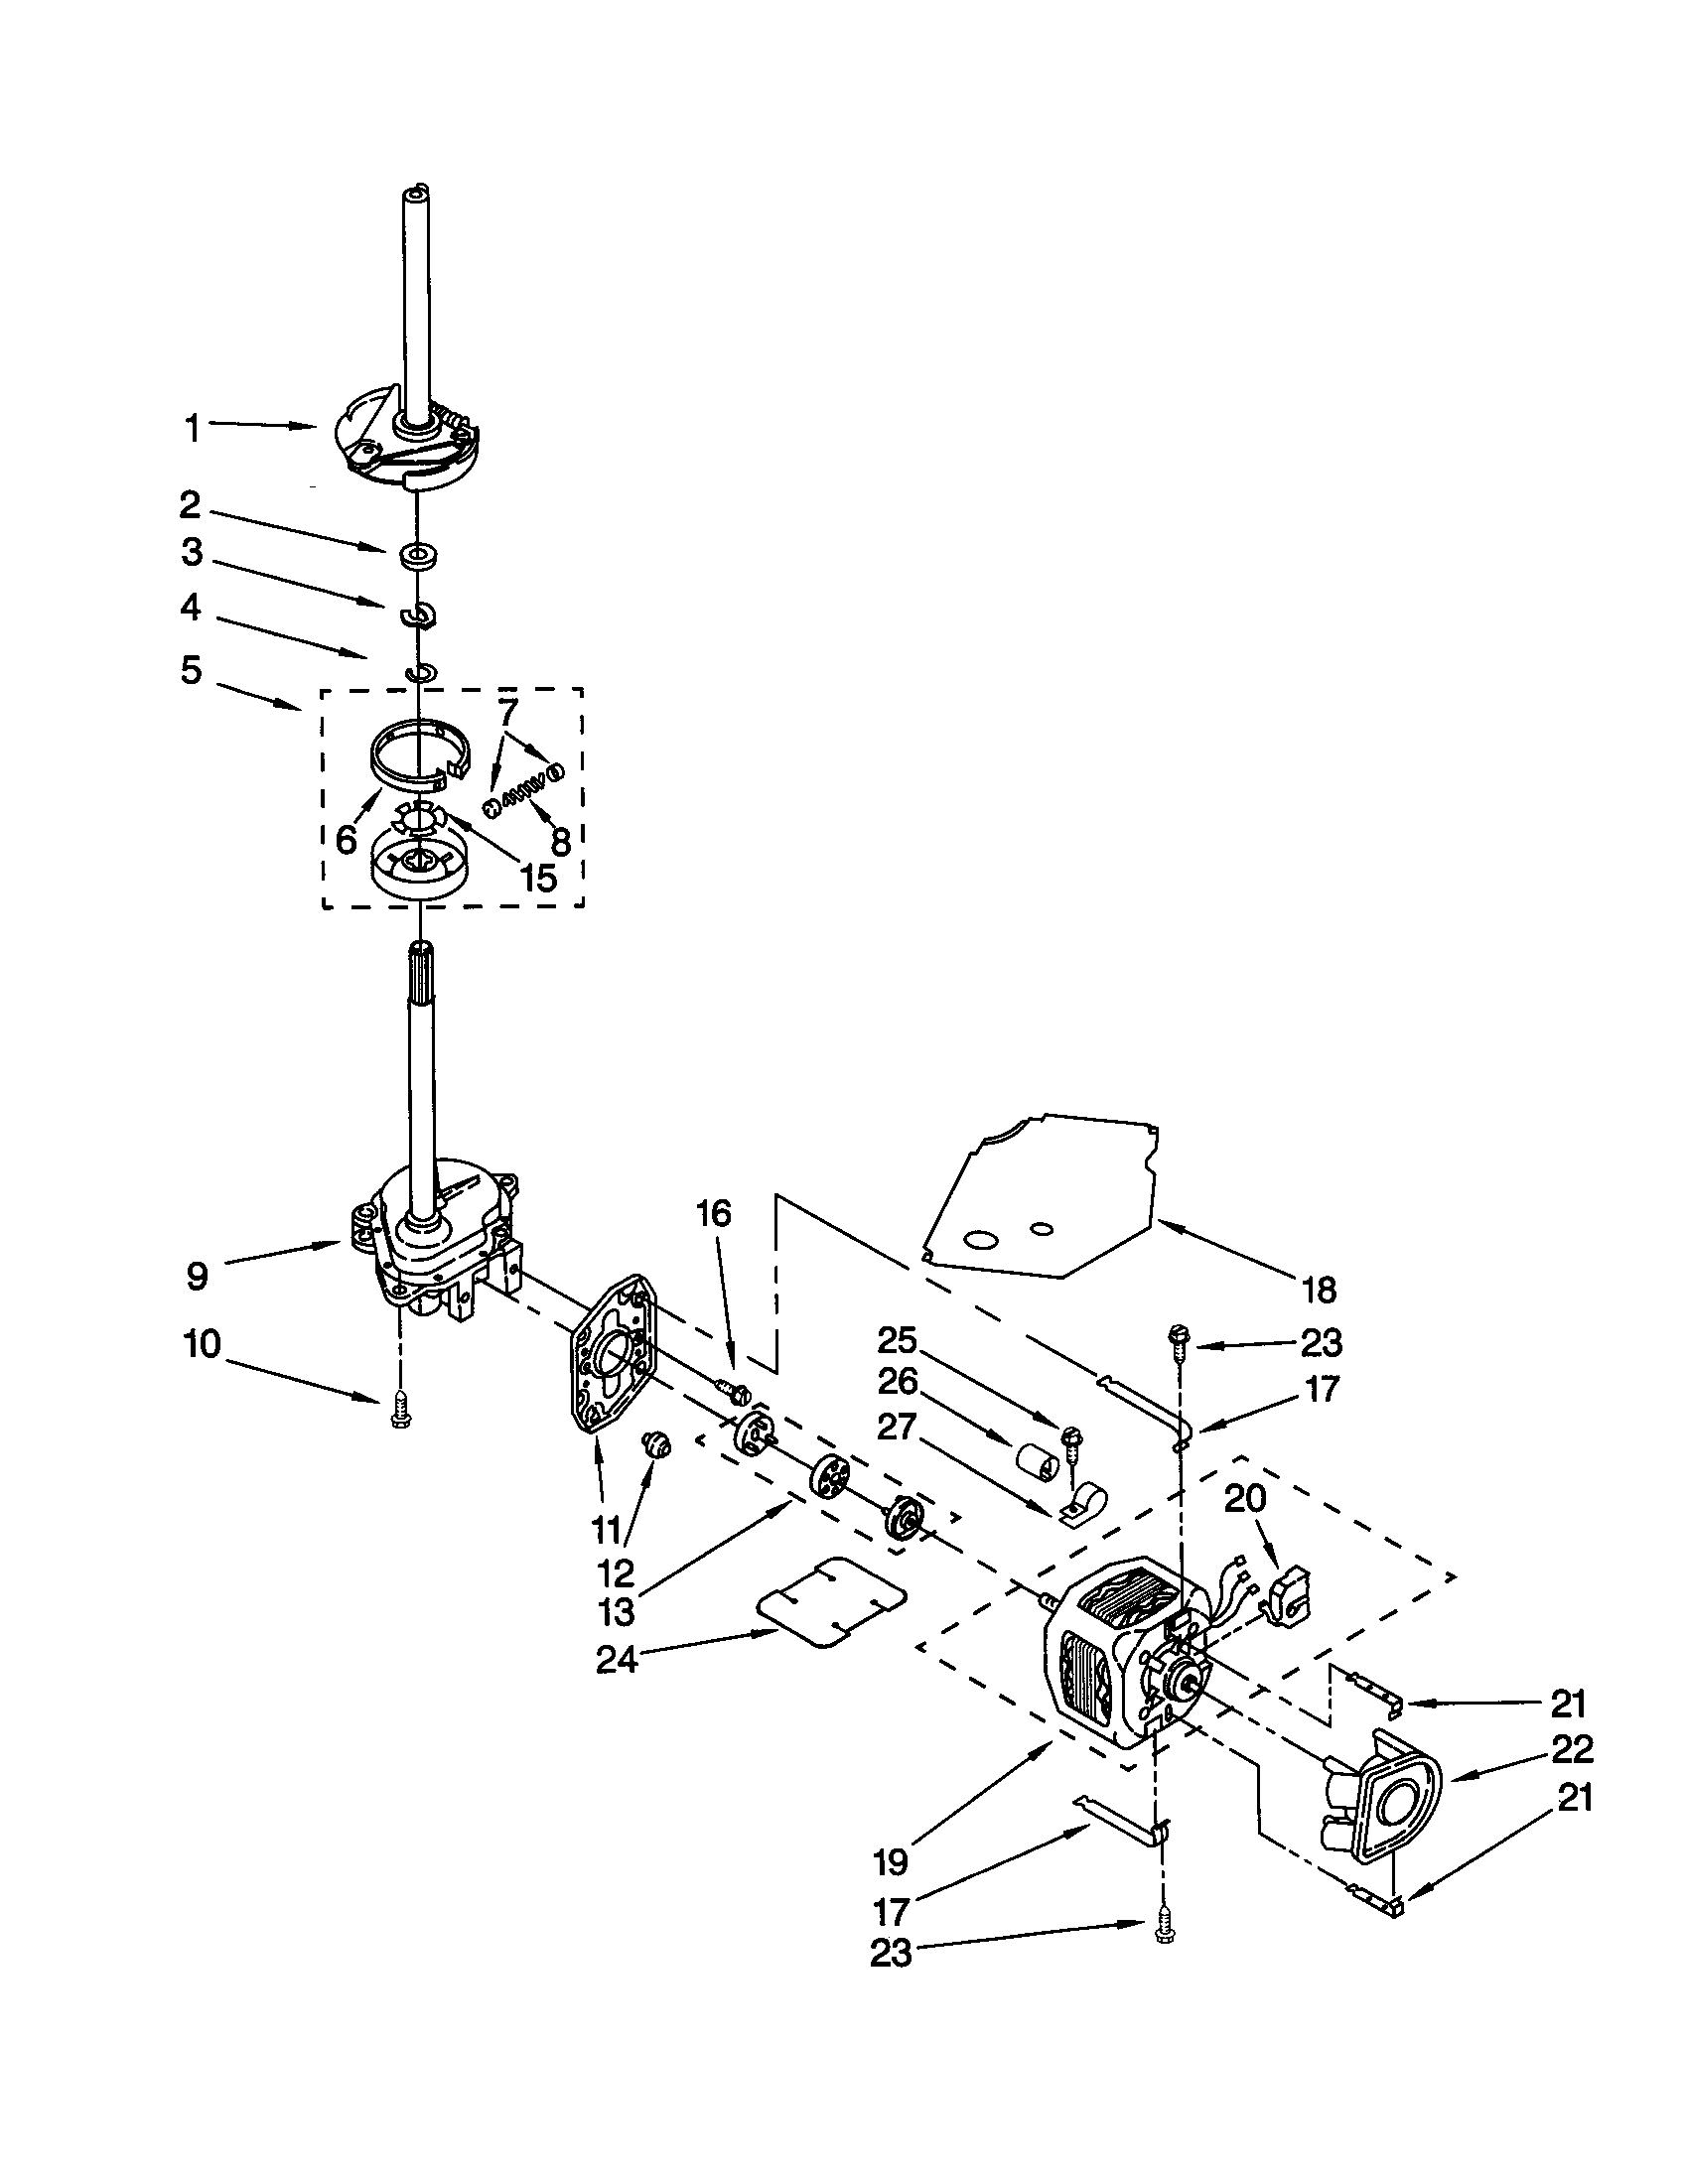 Whirlpool Lxr Jq0 Start Capacitor